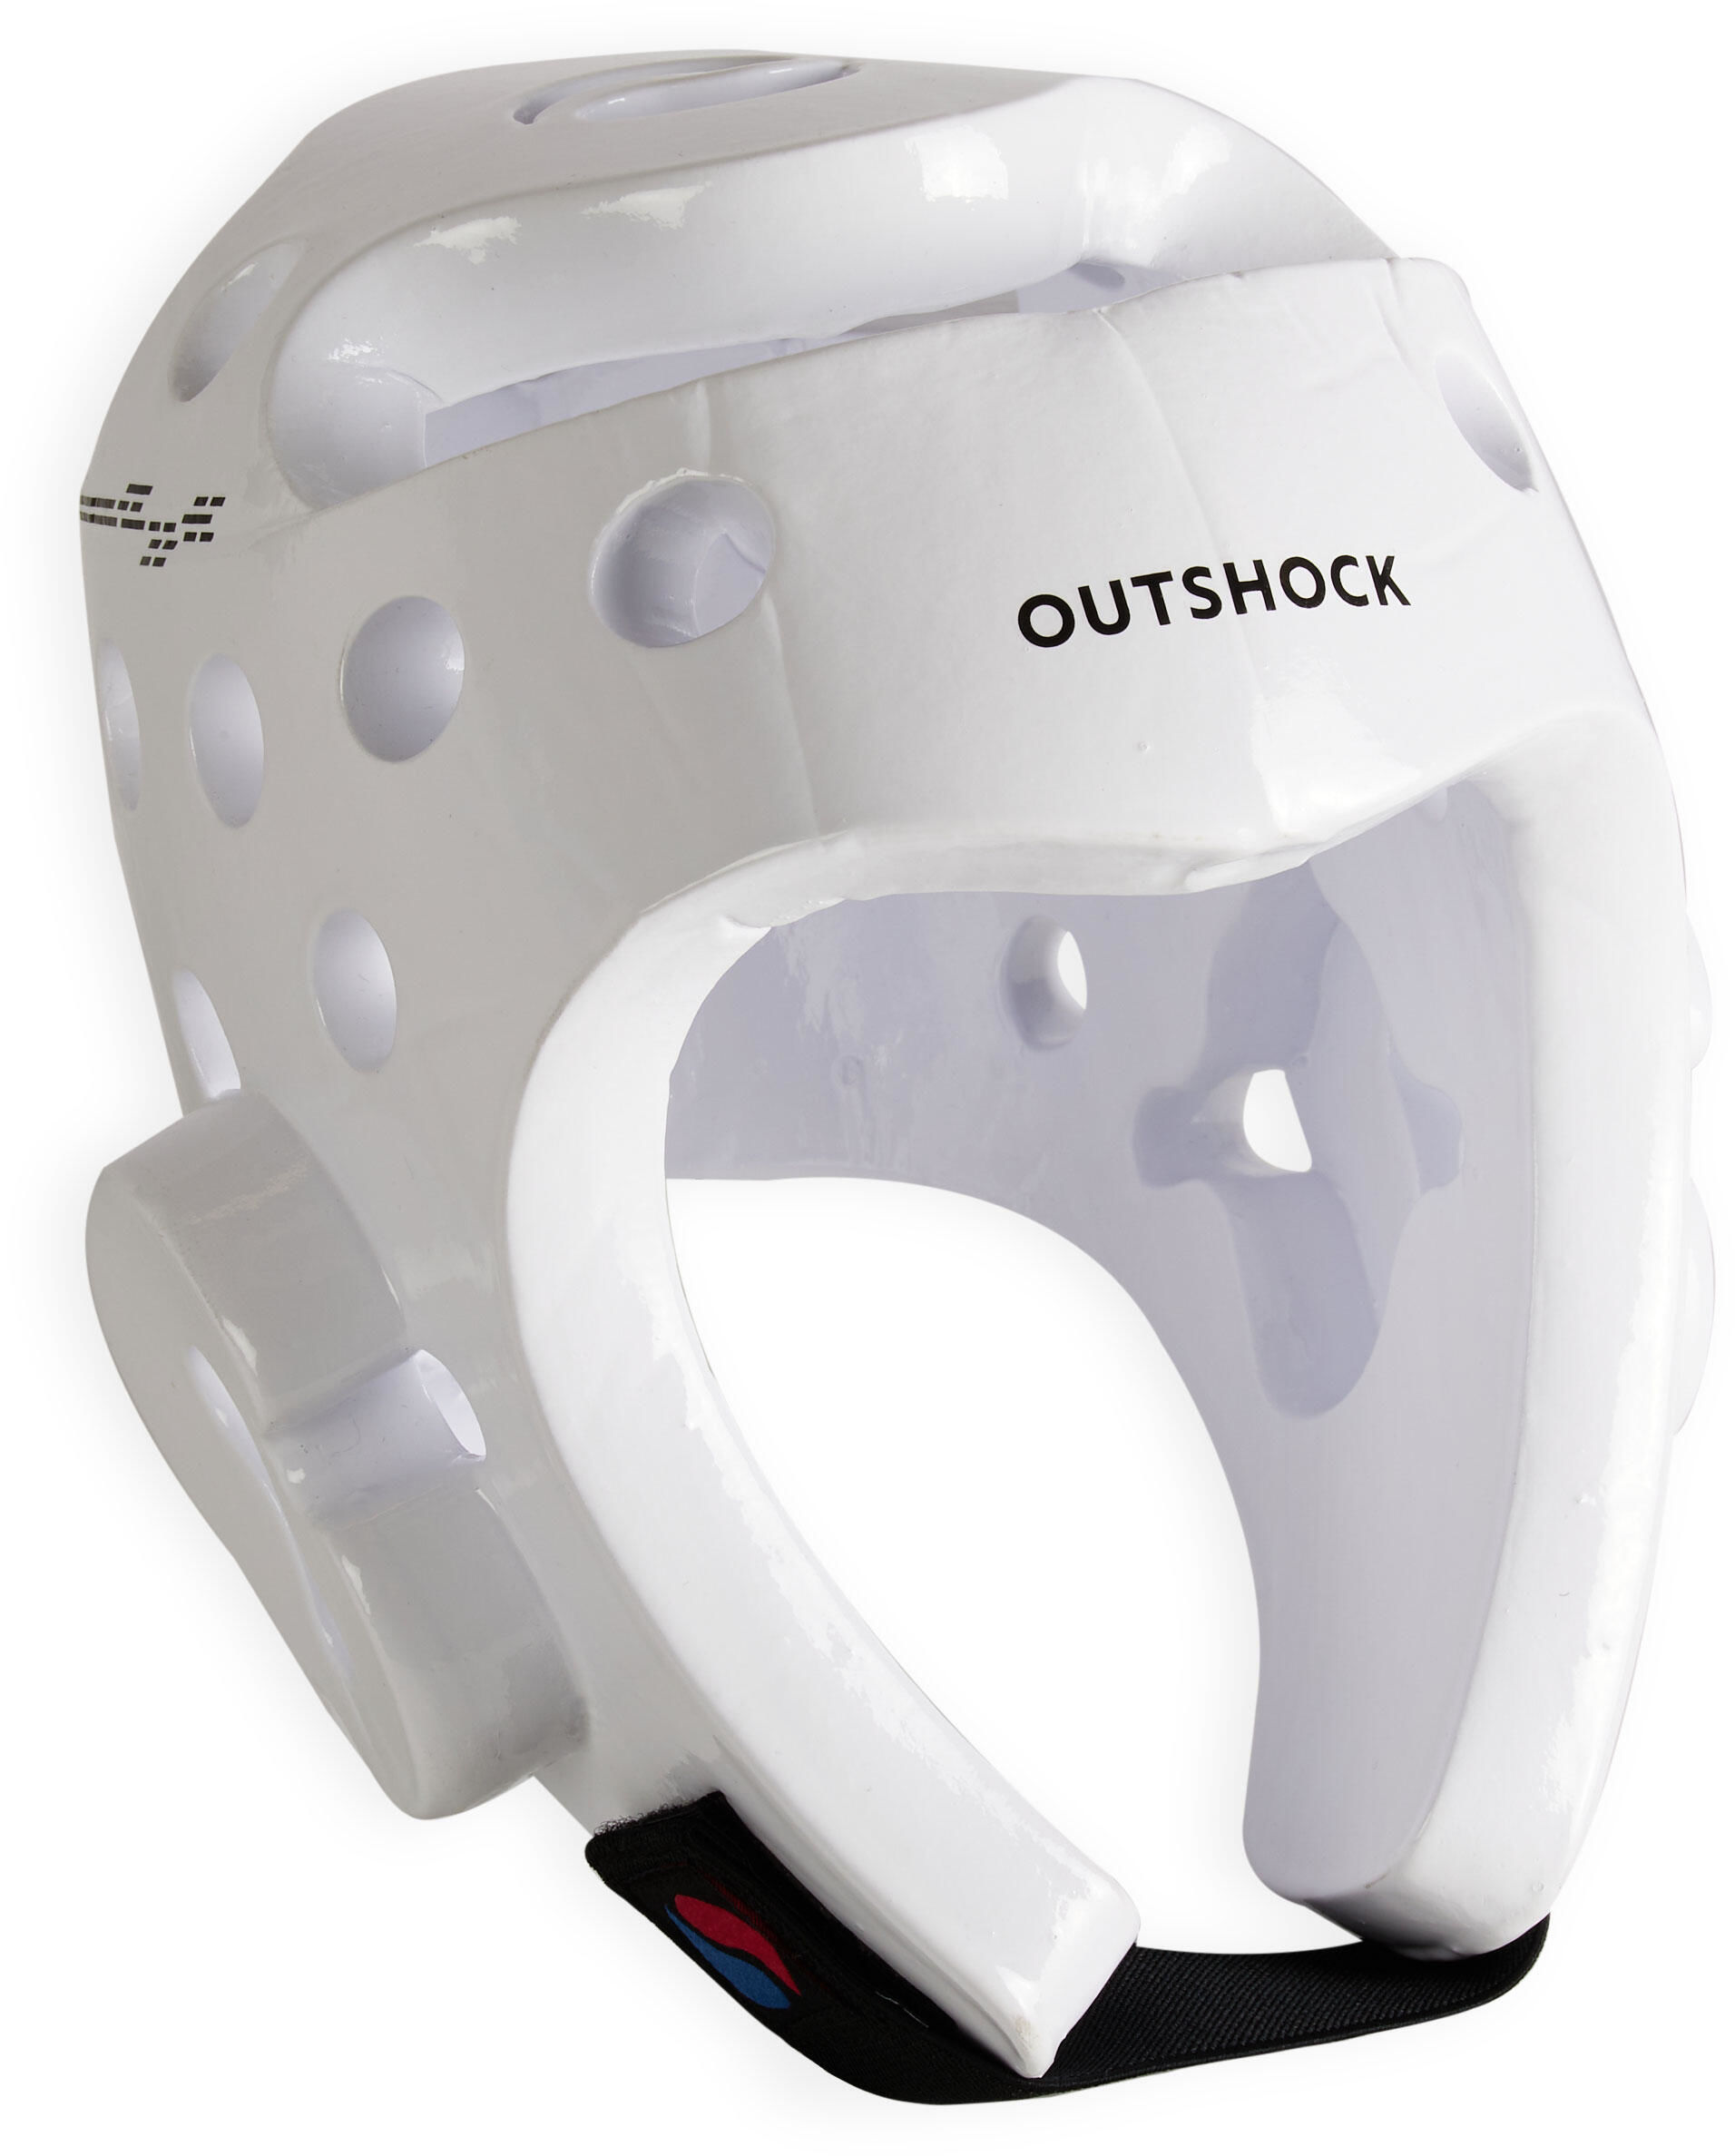 Kask do taekwondo Outshock 500